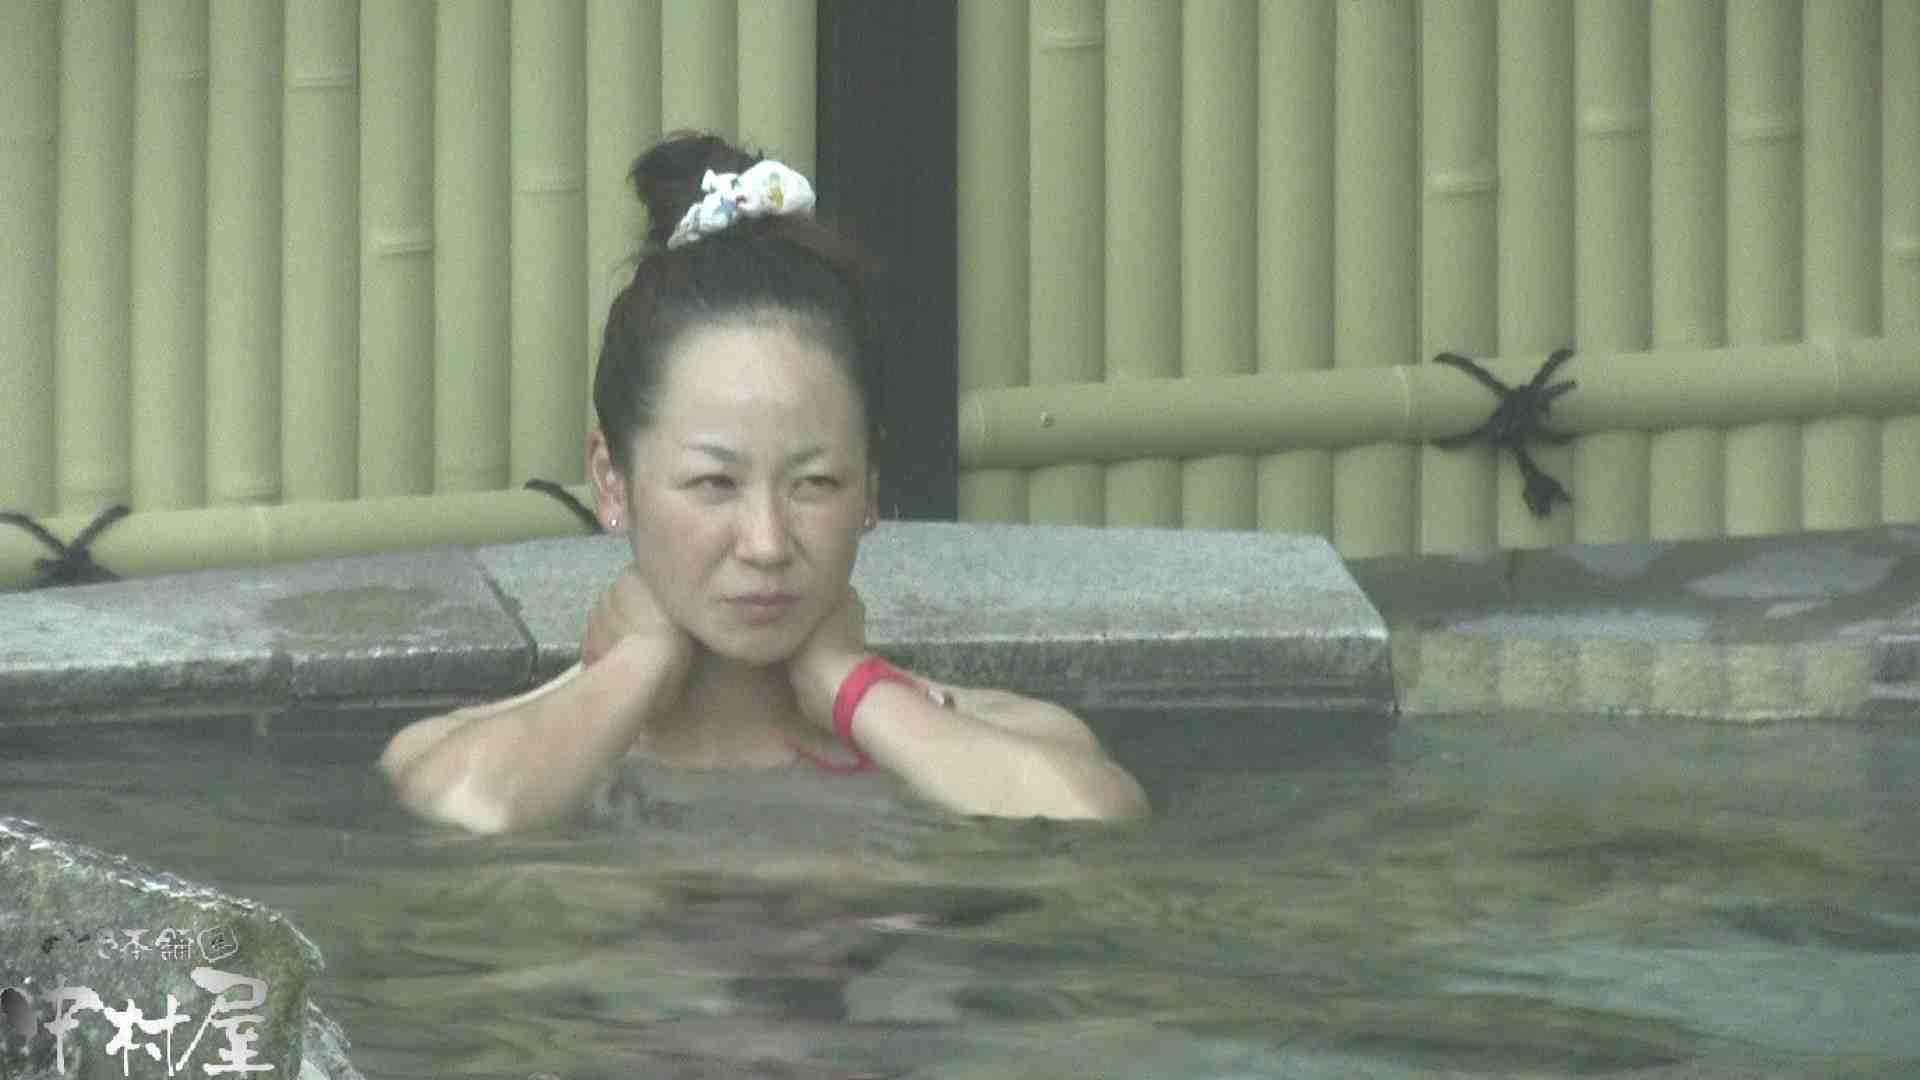 Aquaな露天風呂Vol.911 OLセックス 隠し撮りすけべAV動画紹介 107画像 29